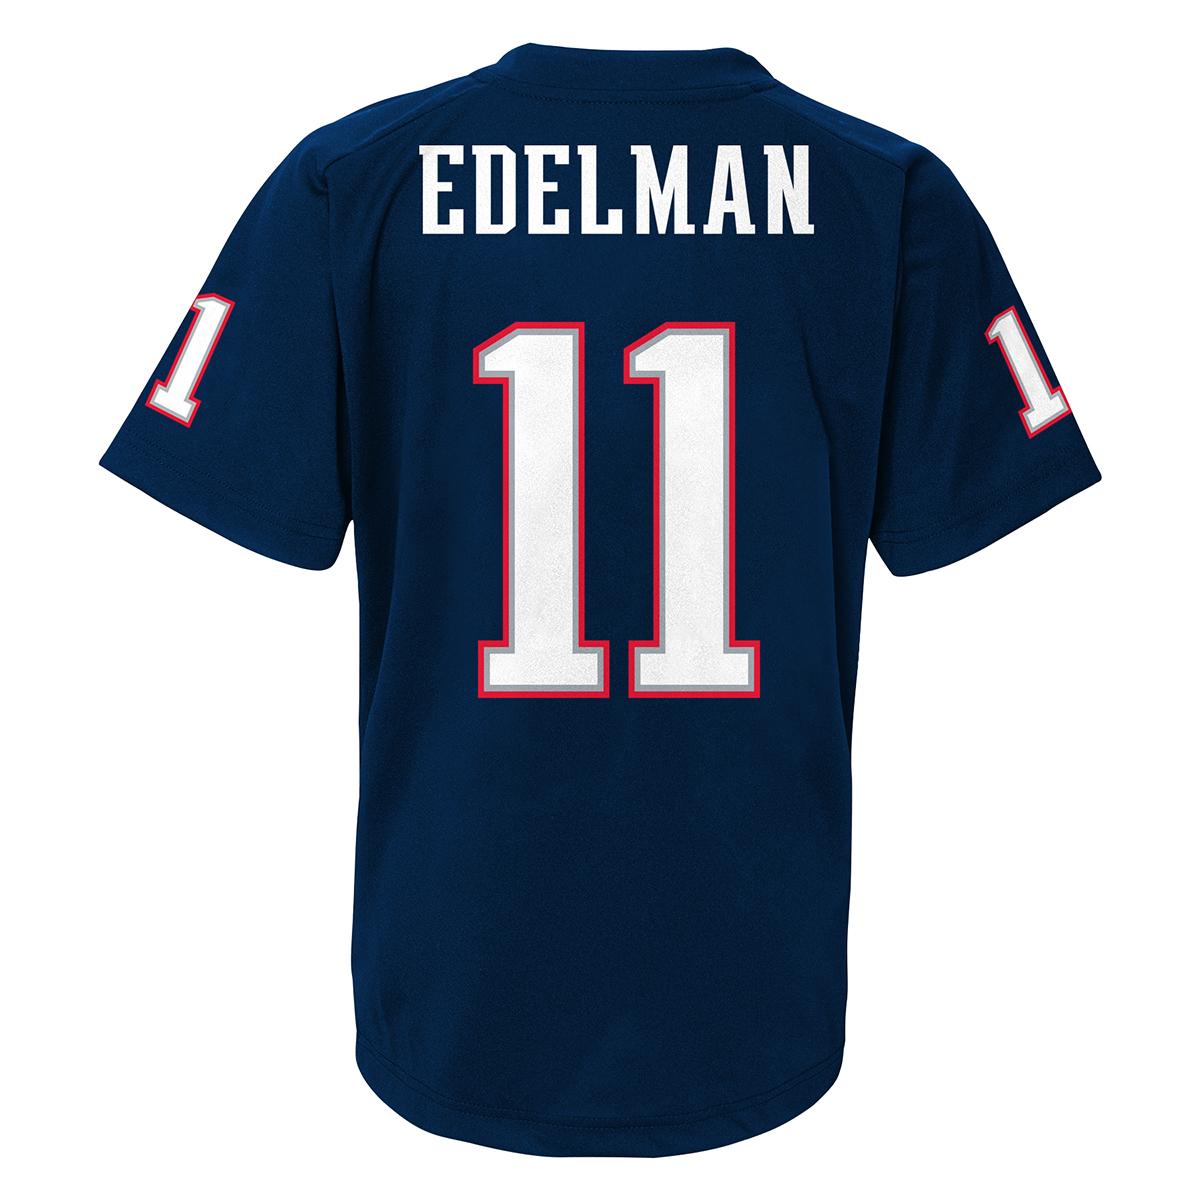 3036c552 New England Patriots Apparel & Gear: Jerseys, Hats & More | Bob's Stores